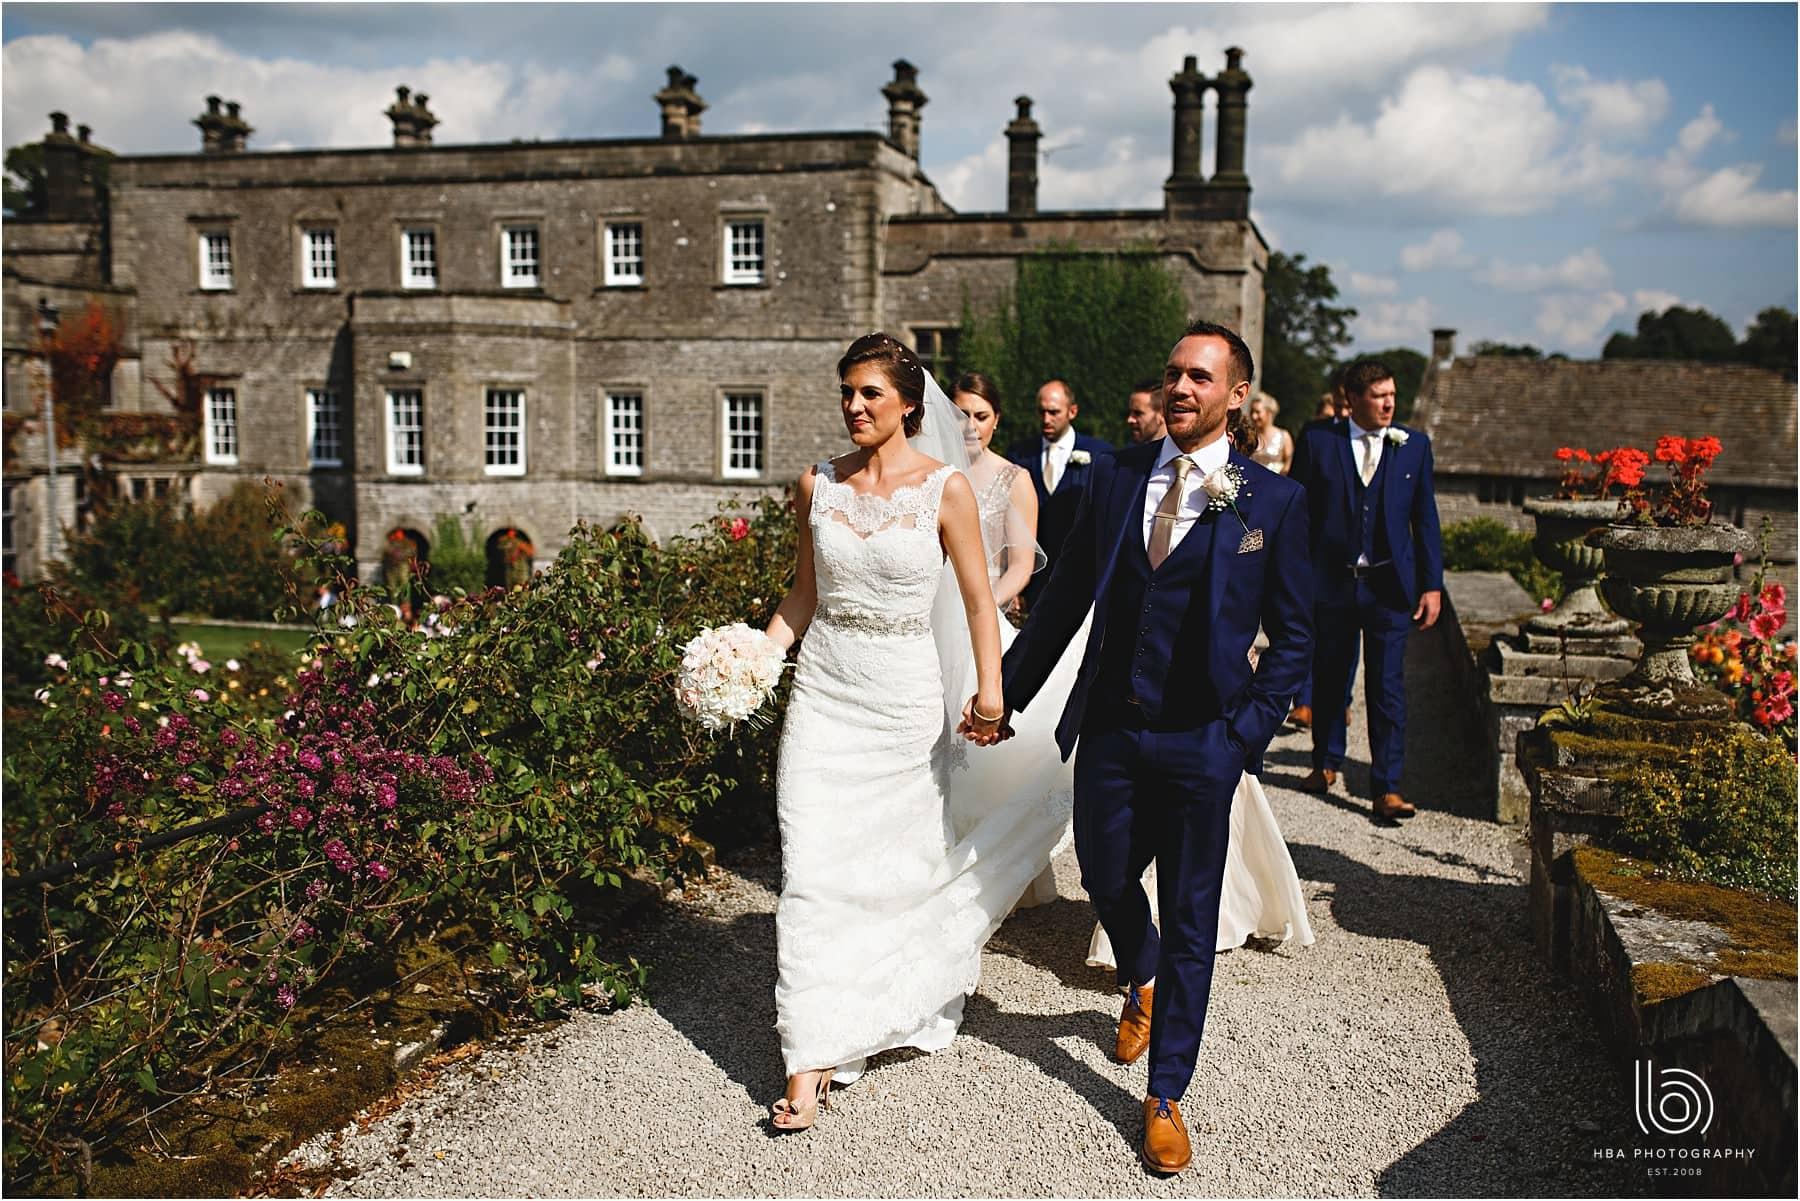 the bride & groom walking at Tissington Hall